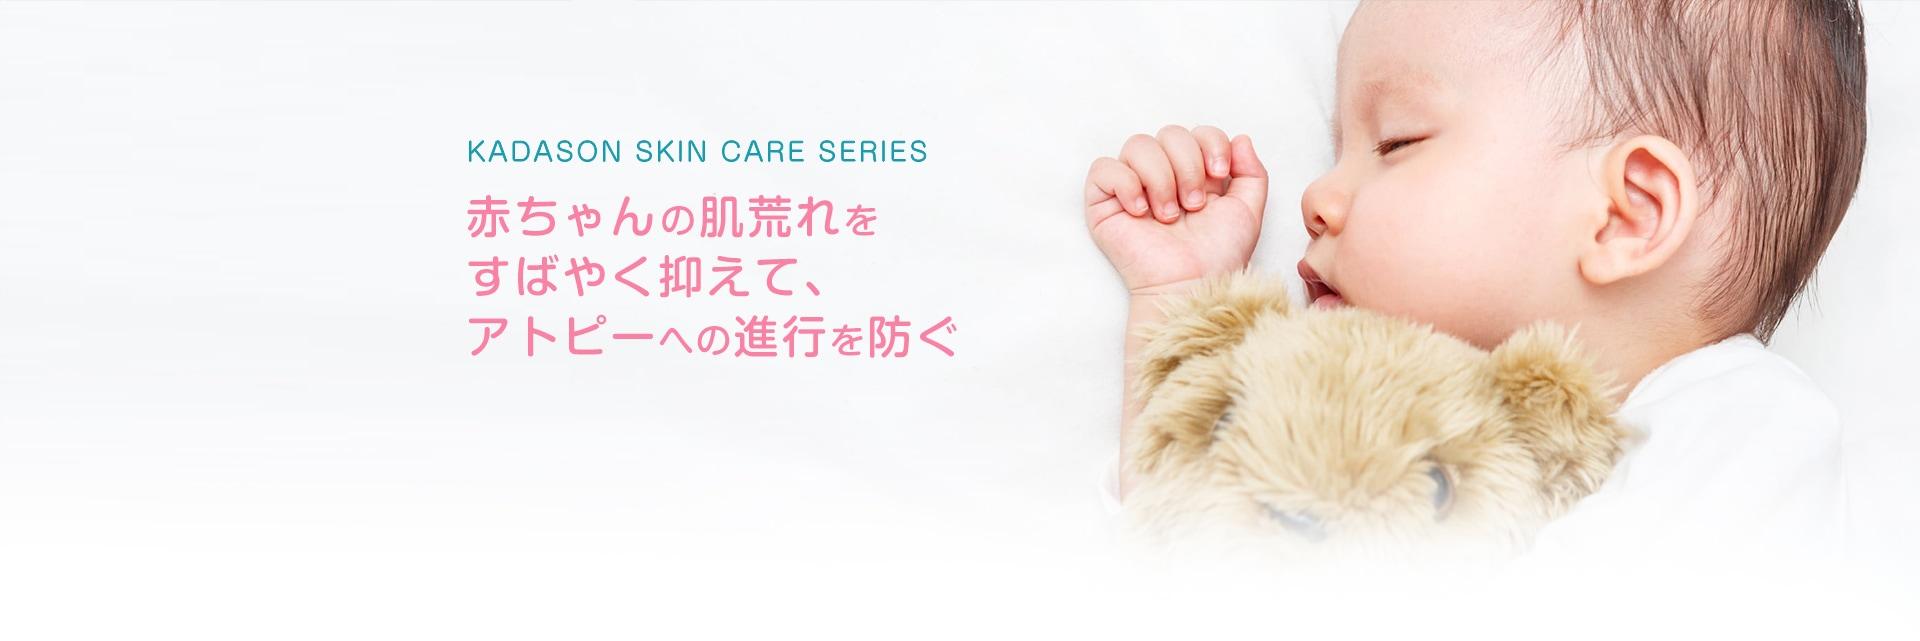 KADASON SKIN CARE SERIES 赤ちゃんの肌荒れをすばやく抑えて、アトピーへの進行を防ぐ